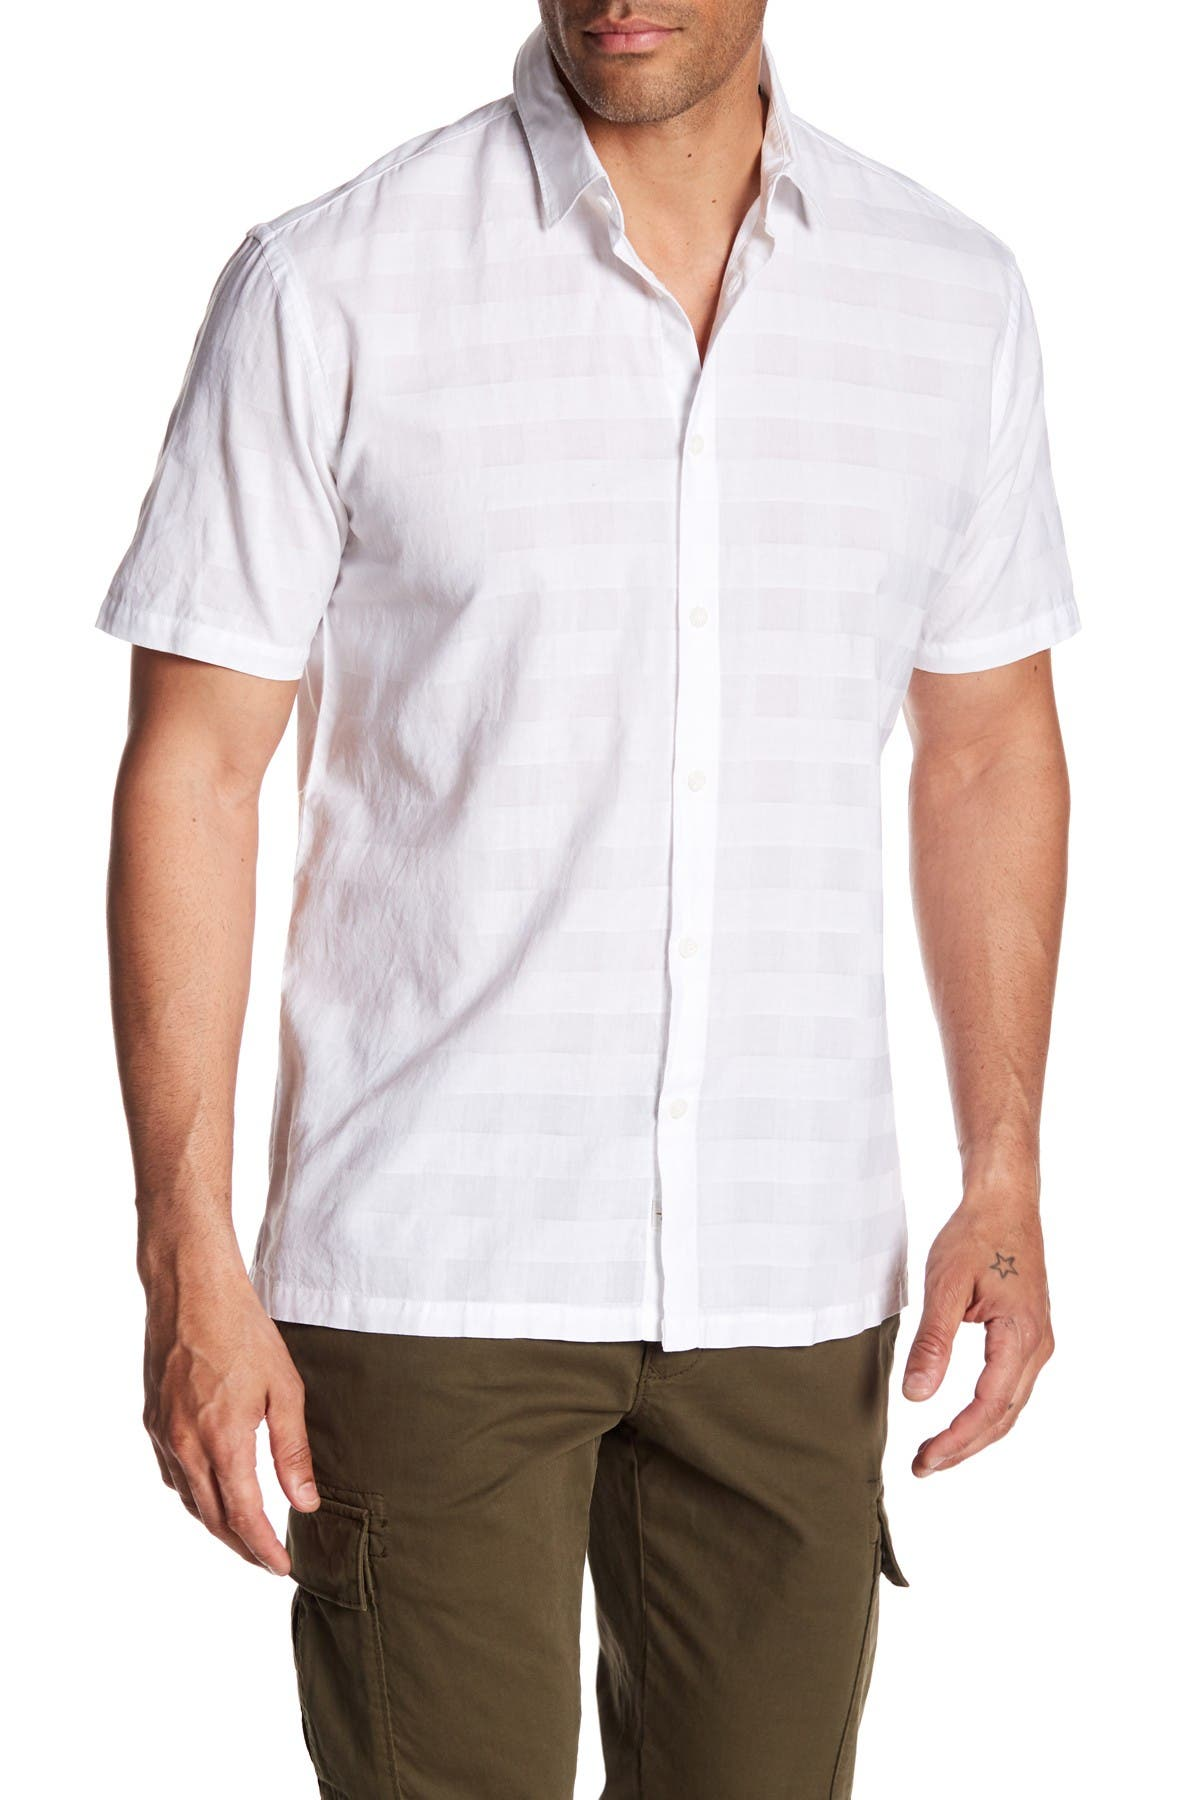 Image of COASTAORO Cristo Tonal Check Short Sleeve Slim Fit Shirt